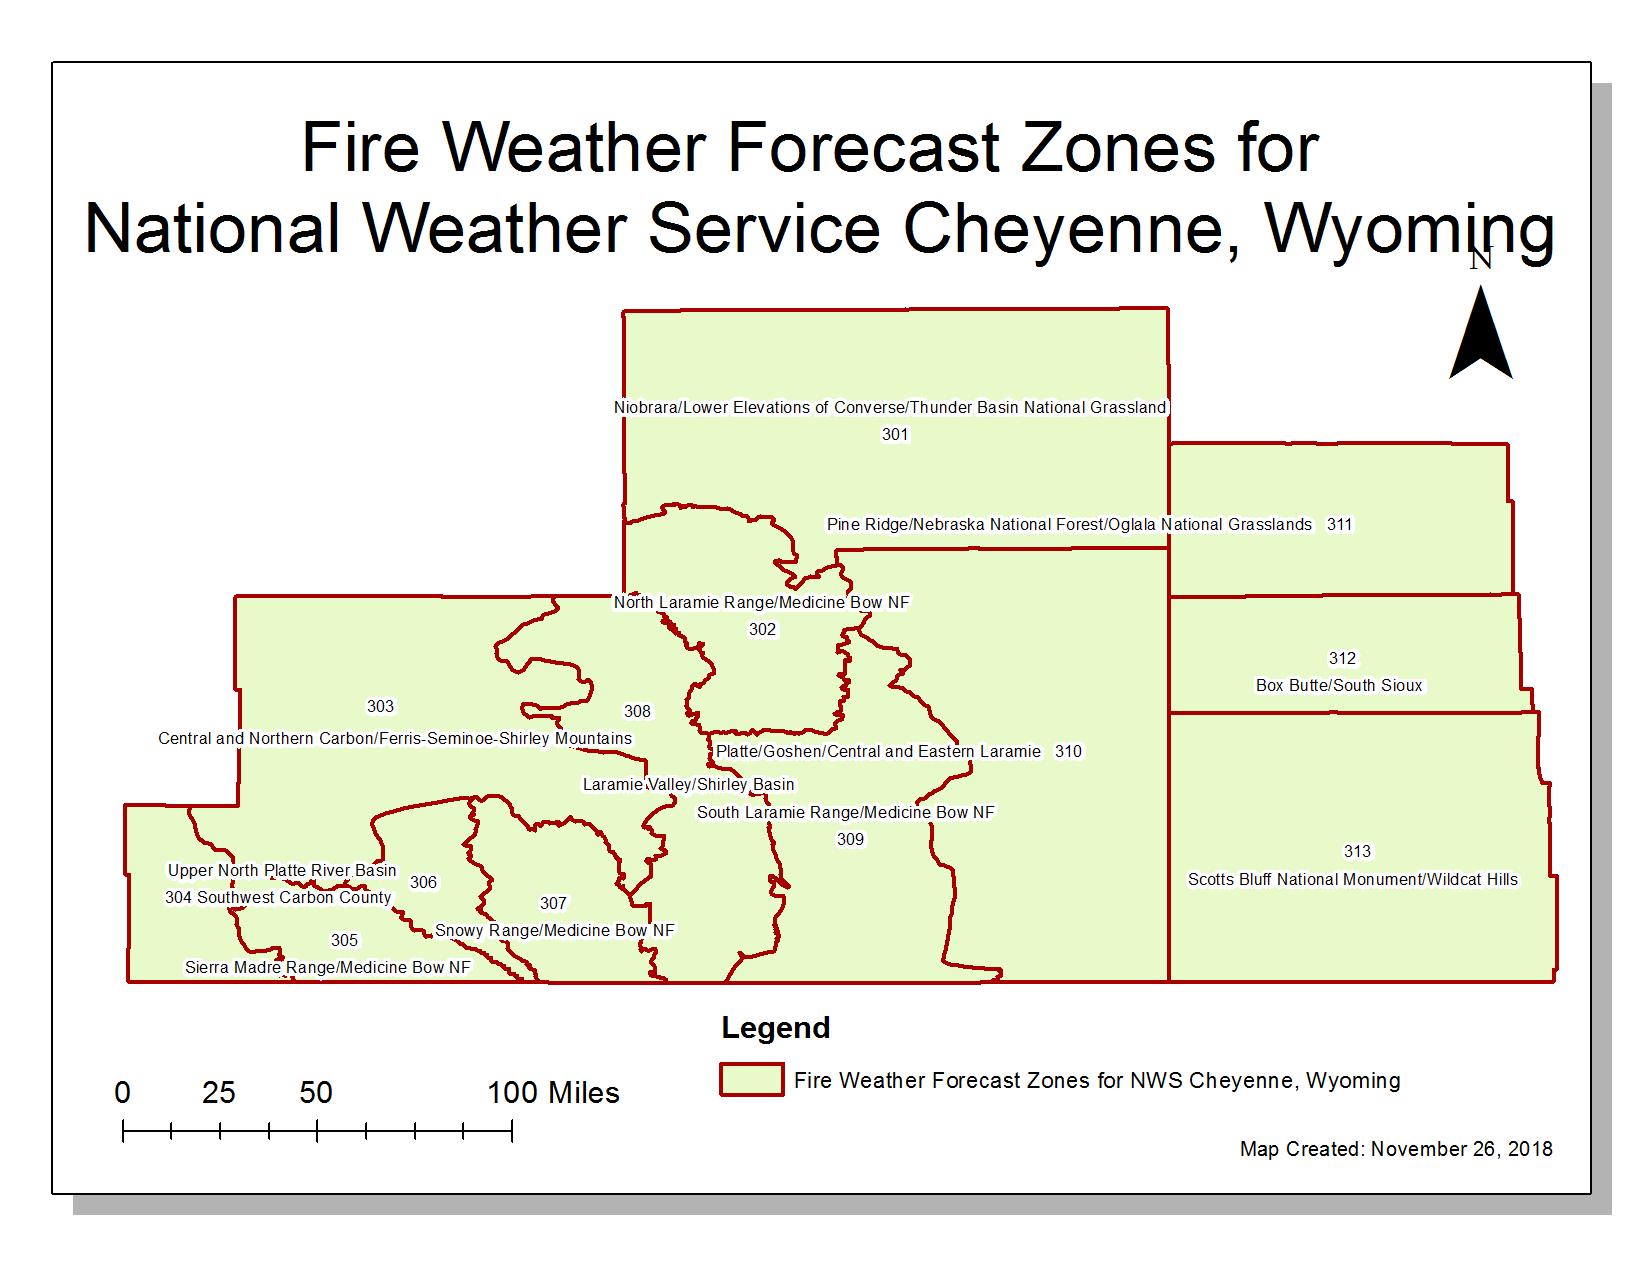 NWS Cheyenne Forecast Office Information on